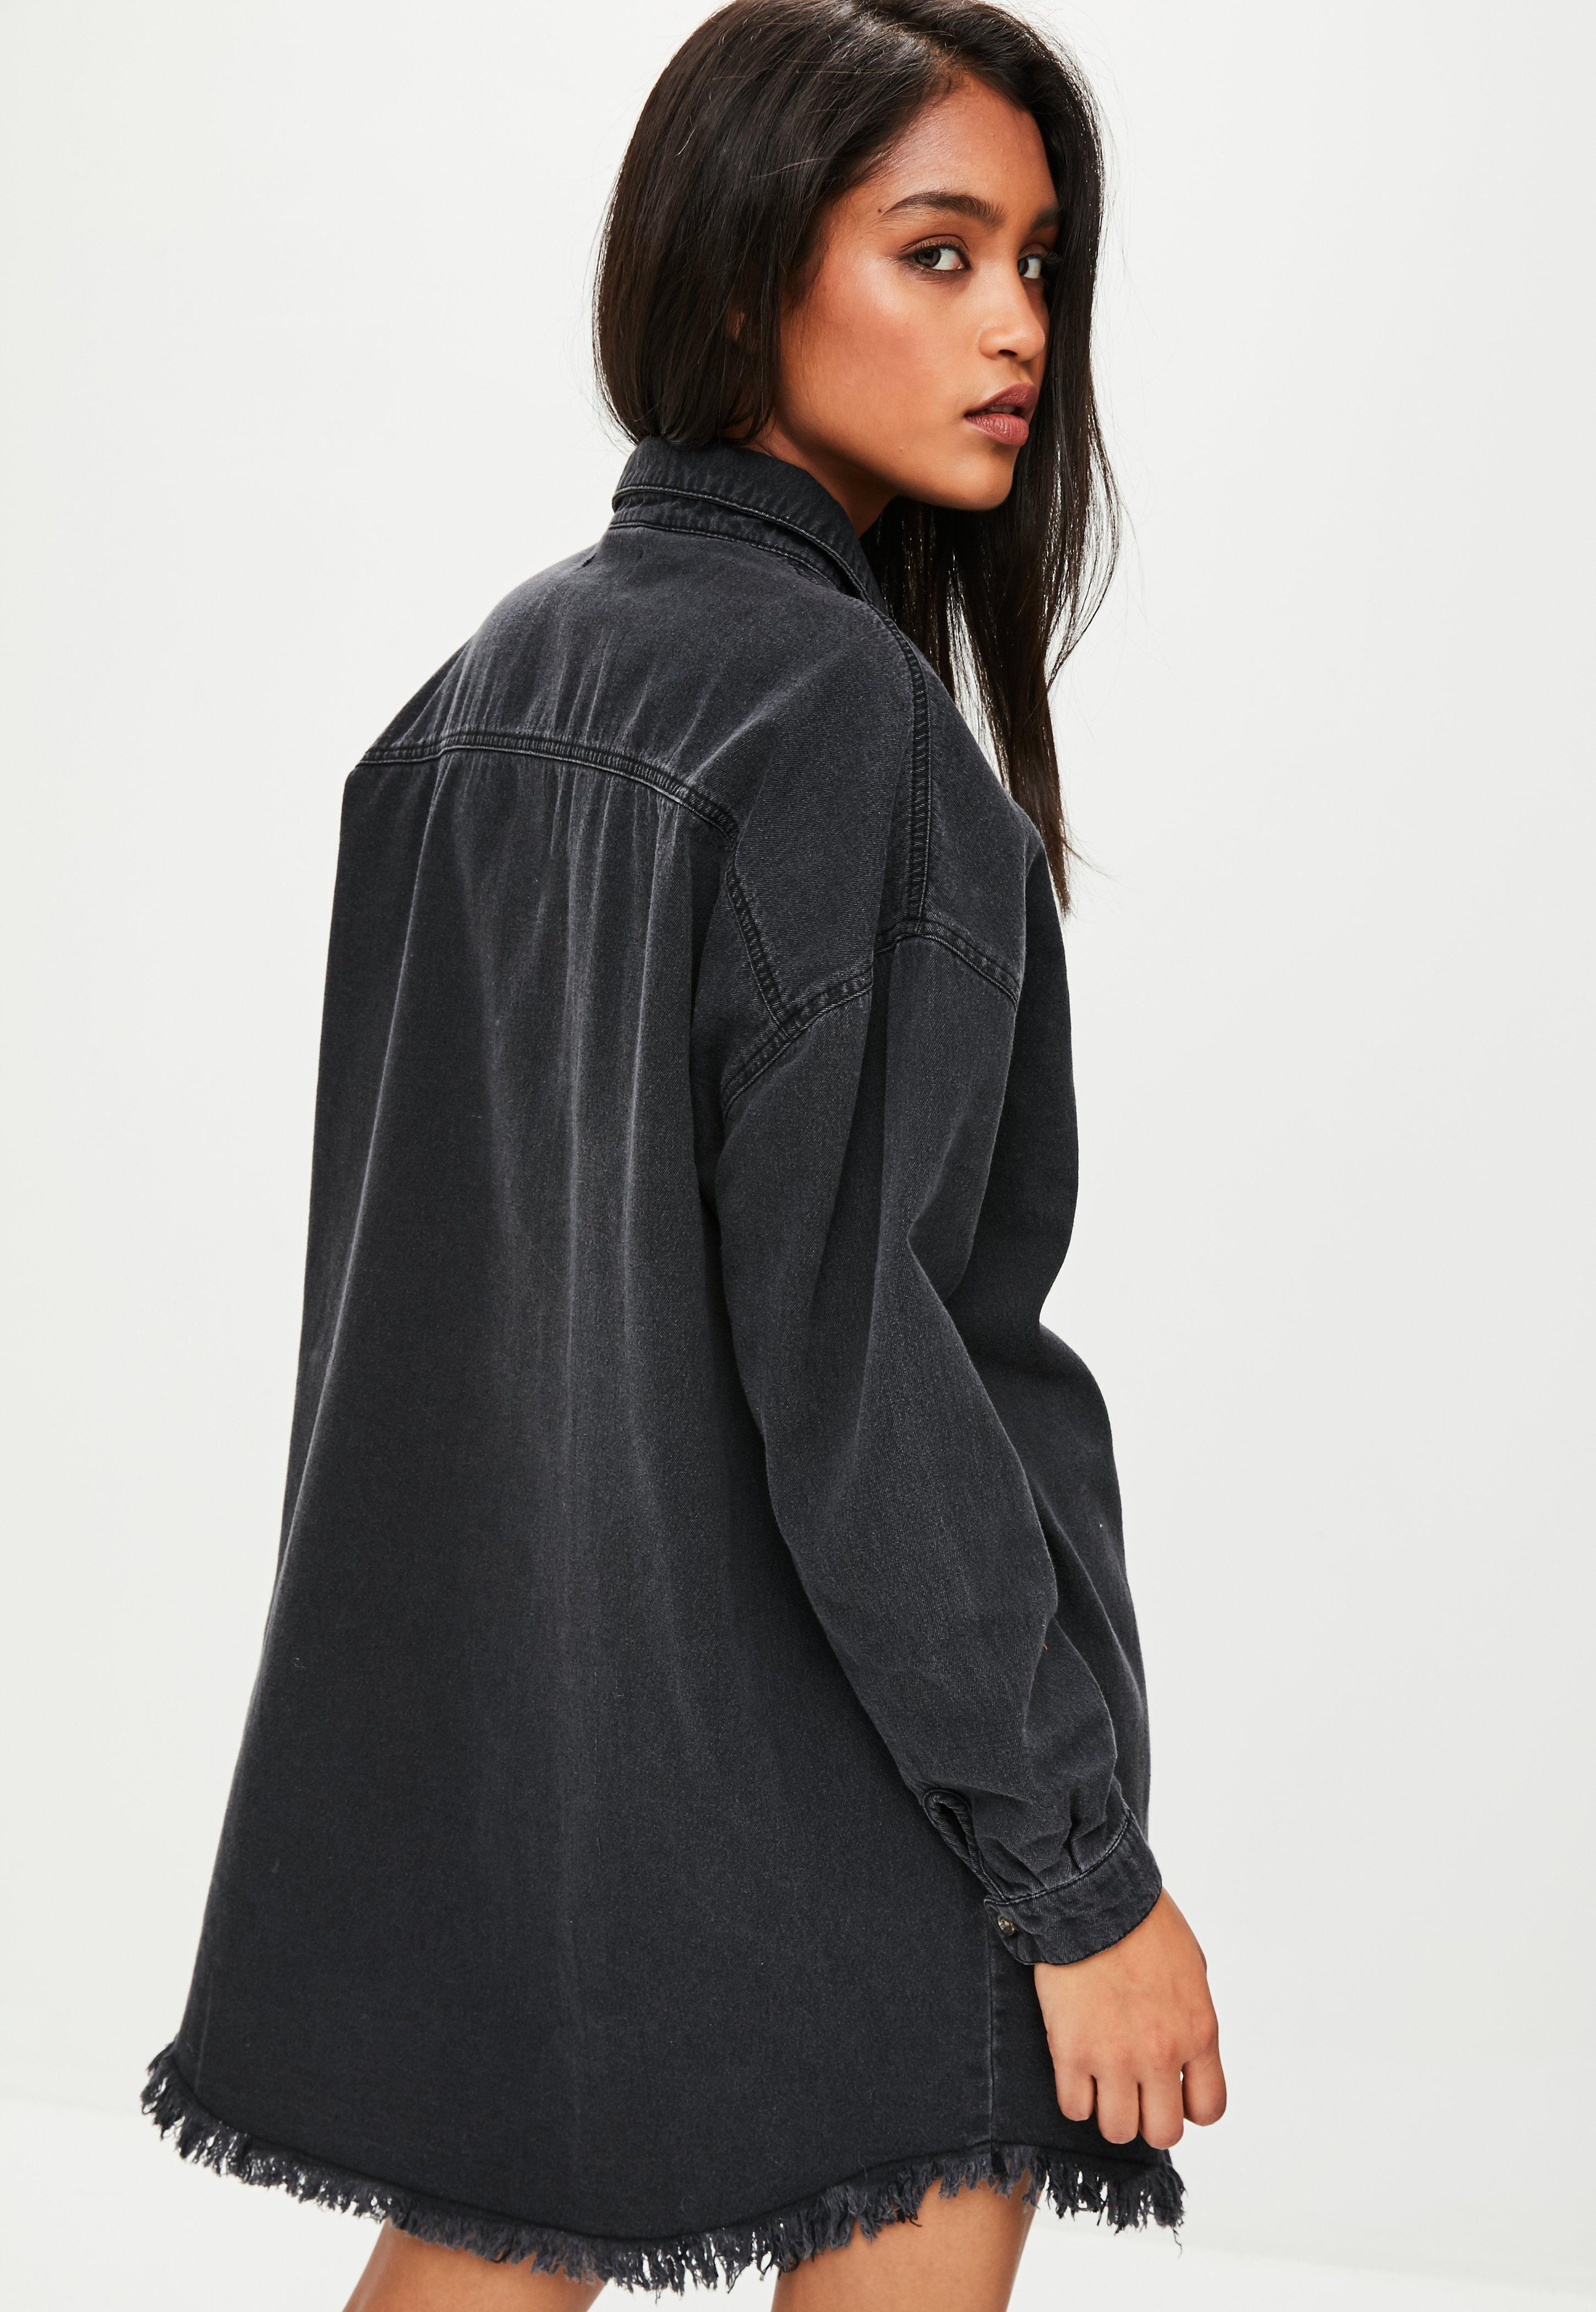 250dcf06ce Missguided Black Oversized Denim Shirt Dress in Black - Lyst